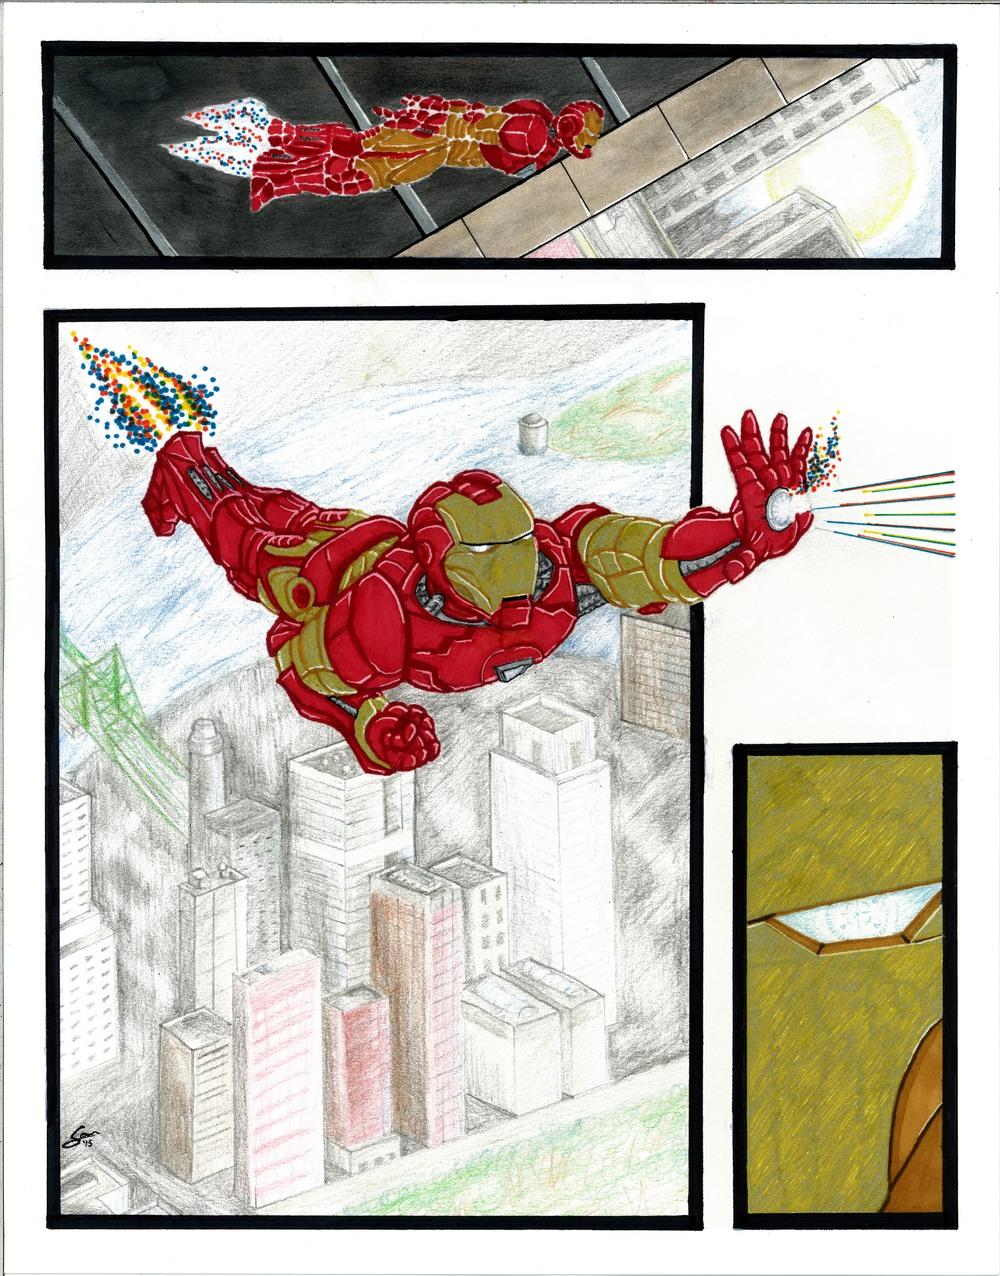 Iron Man - Web.jpg